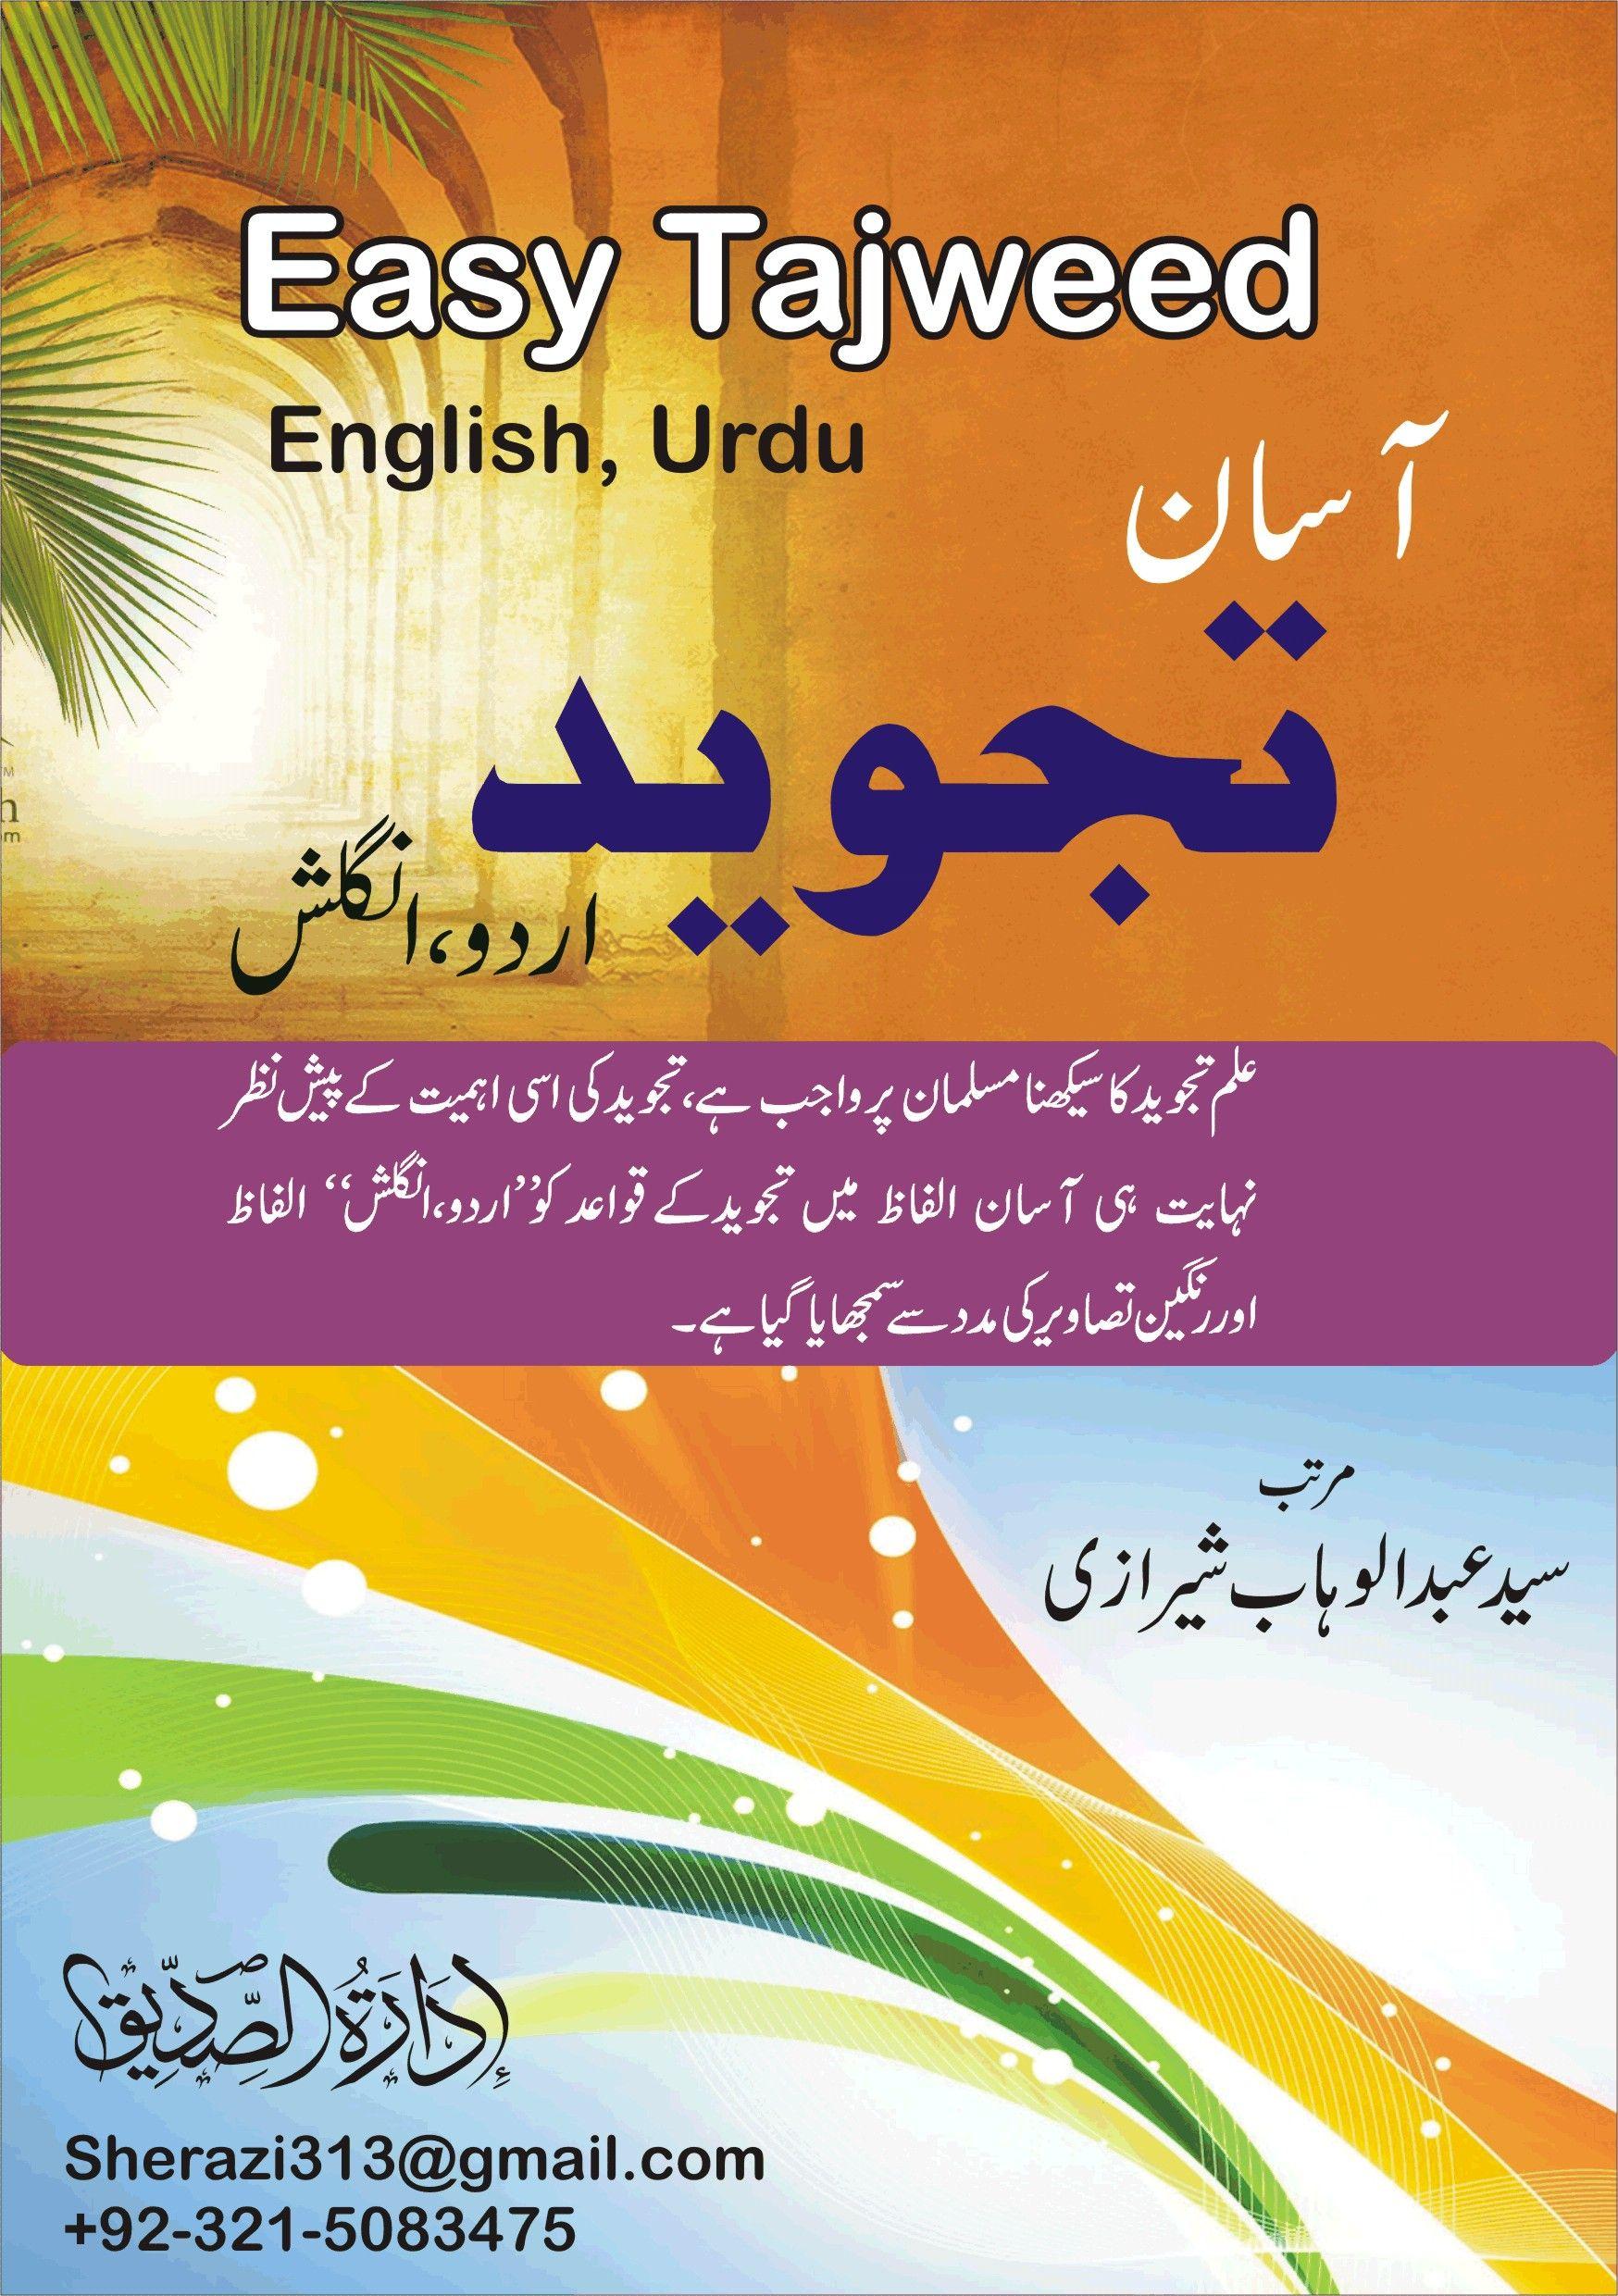 Mushaf tajweed holy quran 1. 1. 0 free download.